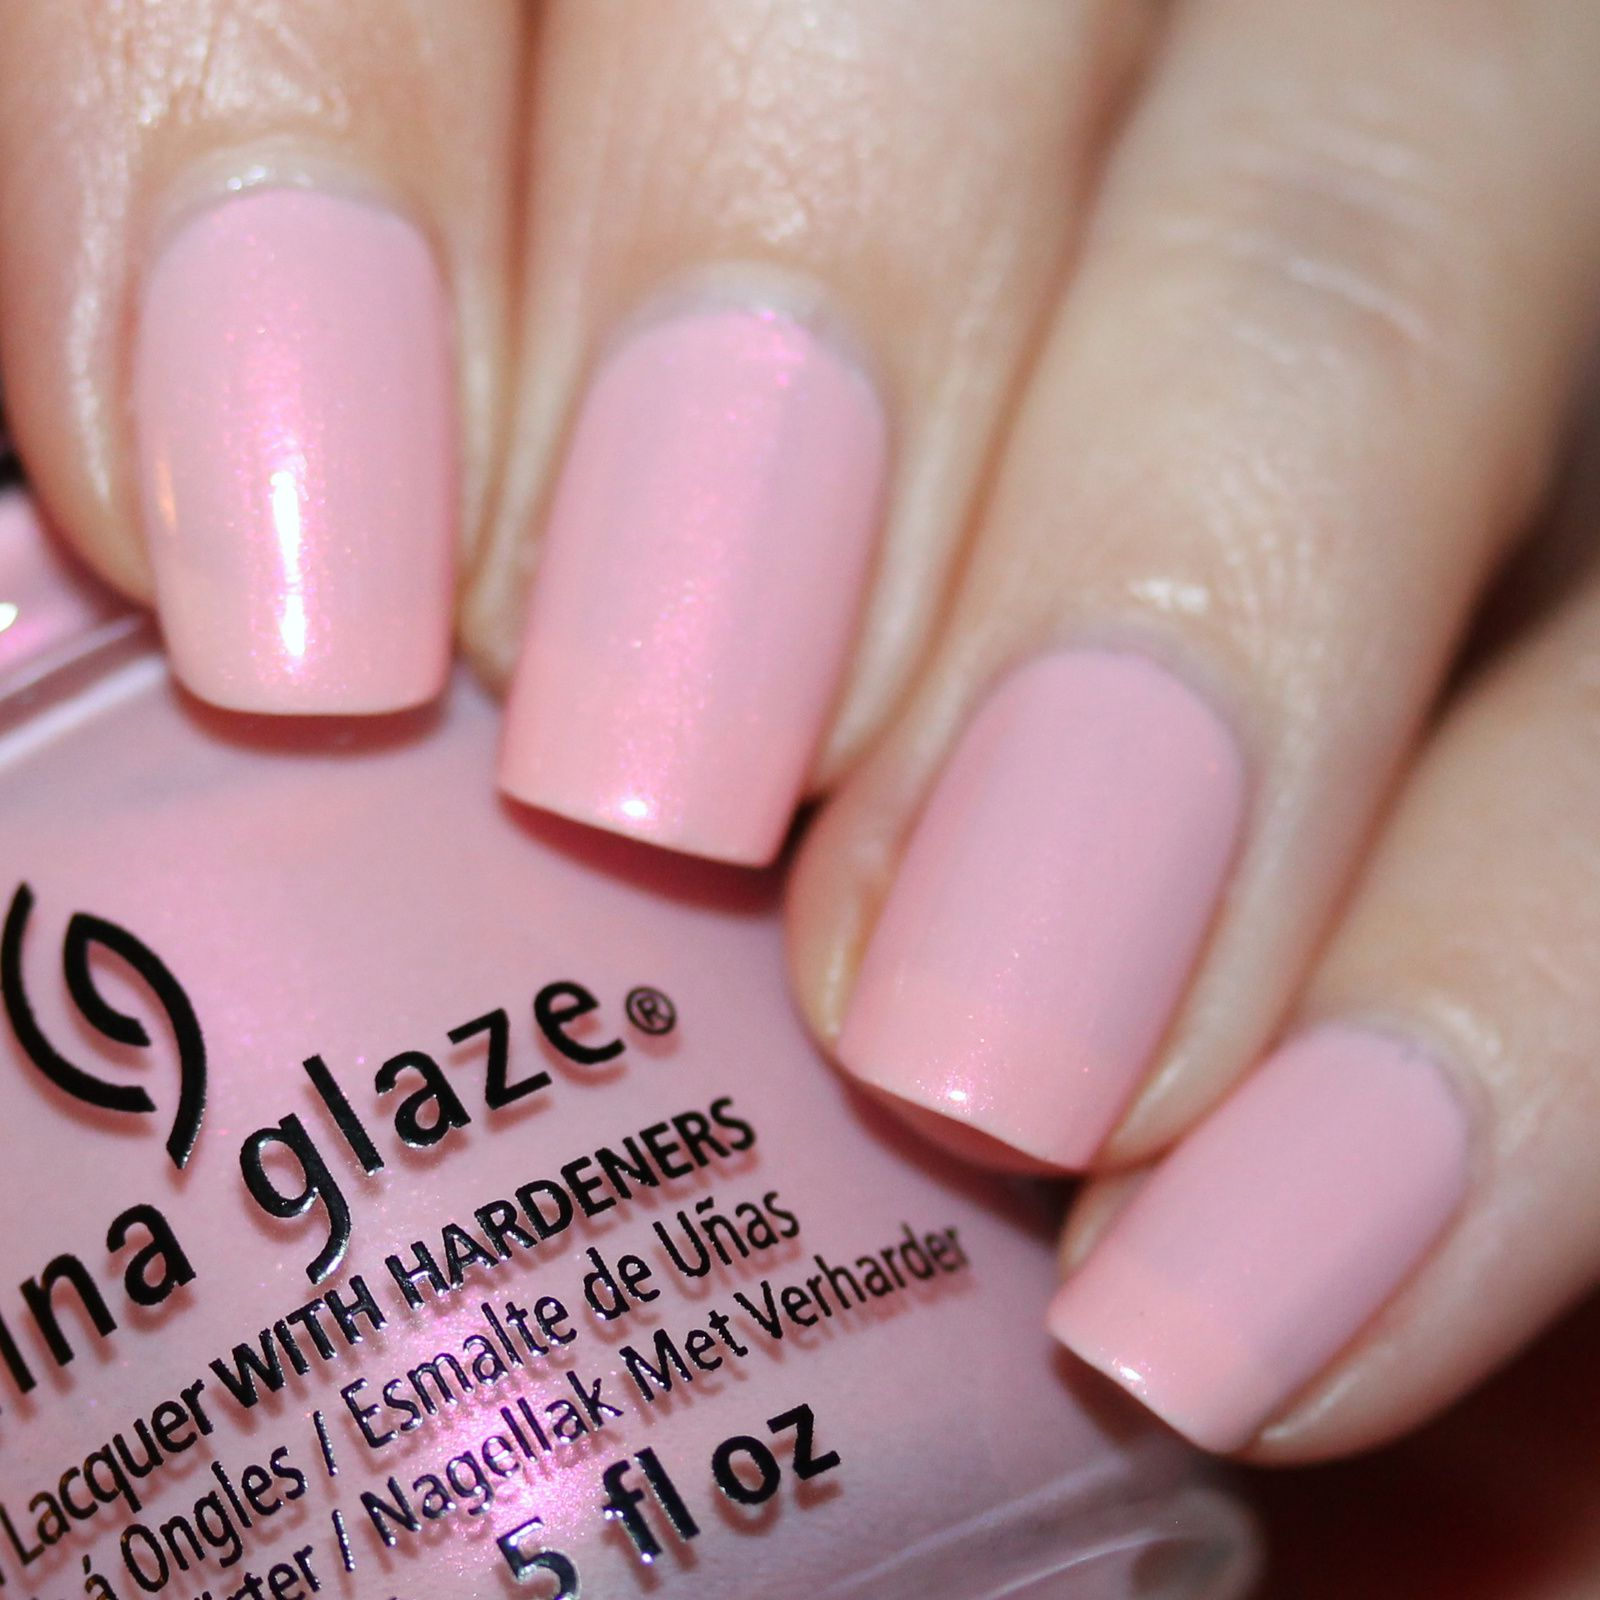 Essie Protein Base Coat / China Glaze Eat, Pink, Be Merry / Poshe Top Coat